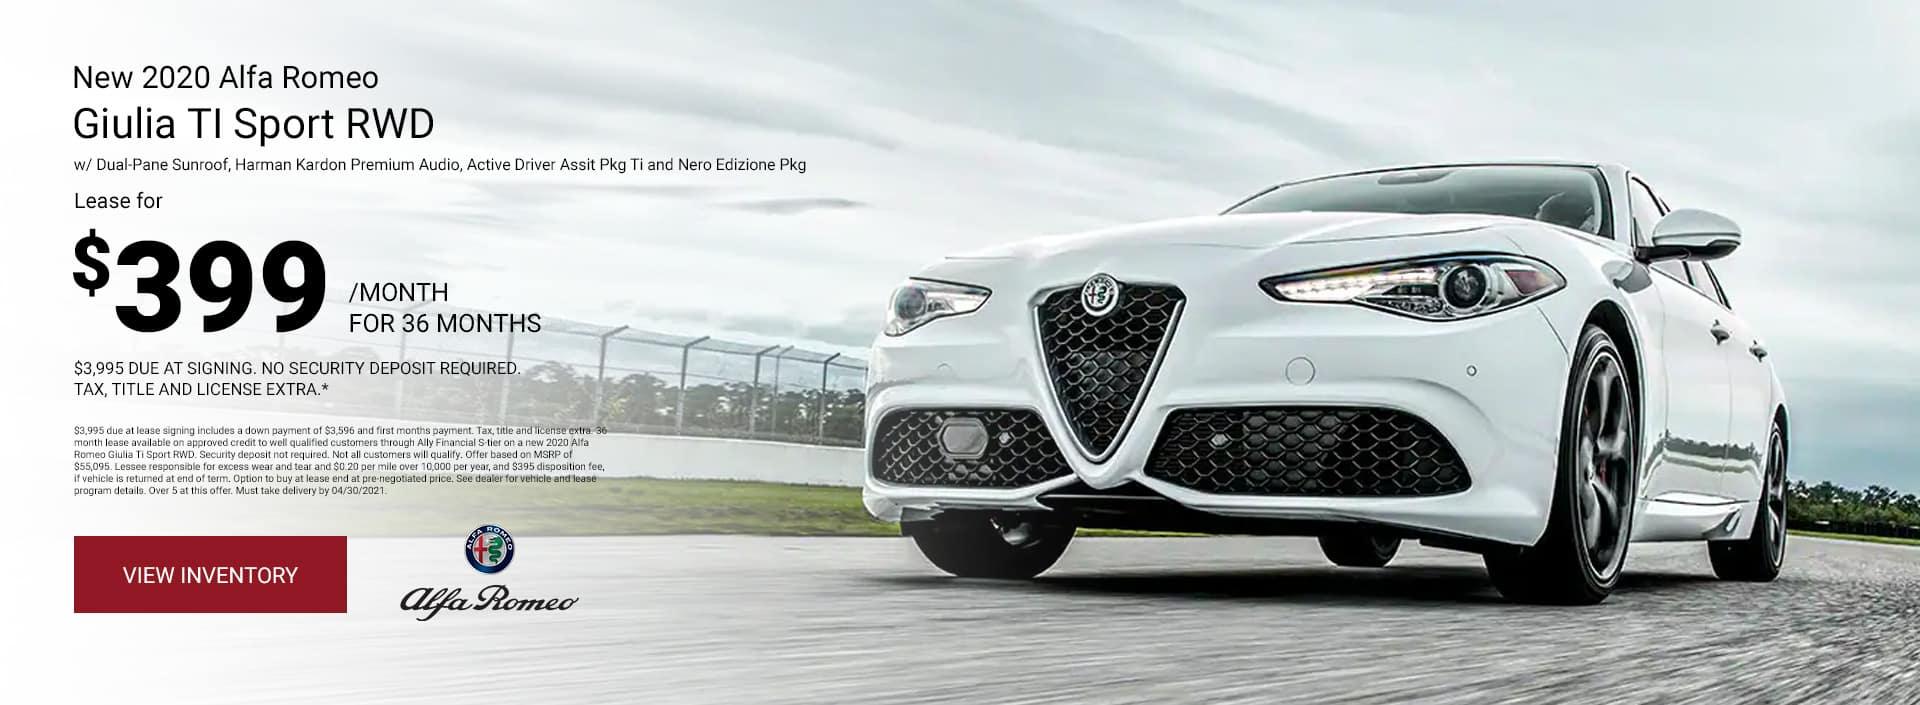 New 2020 Alfa Romeo Giulia Ti Sport RWD w/ Dual-Pane Sunroof, Harman Kardon Premium Audio, Active Driver Assit Pkg Ti and Nero Edizione Pkg